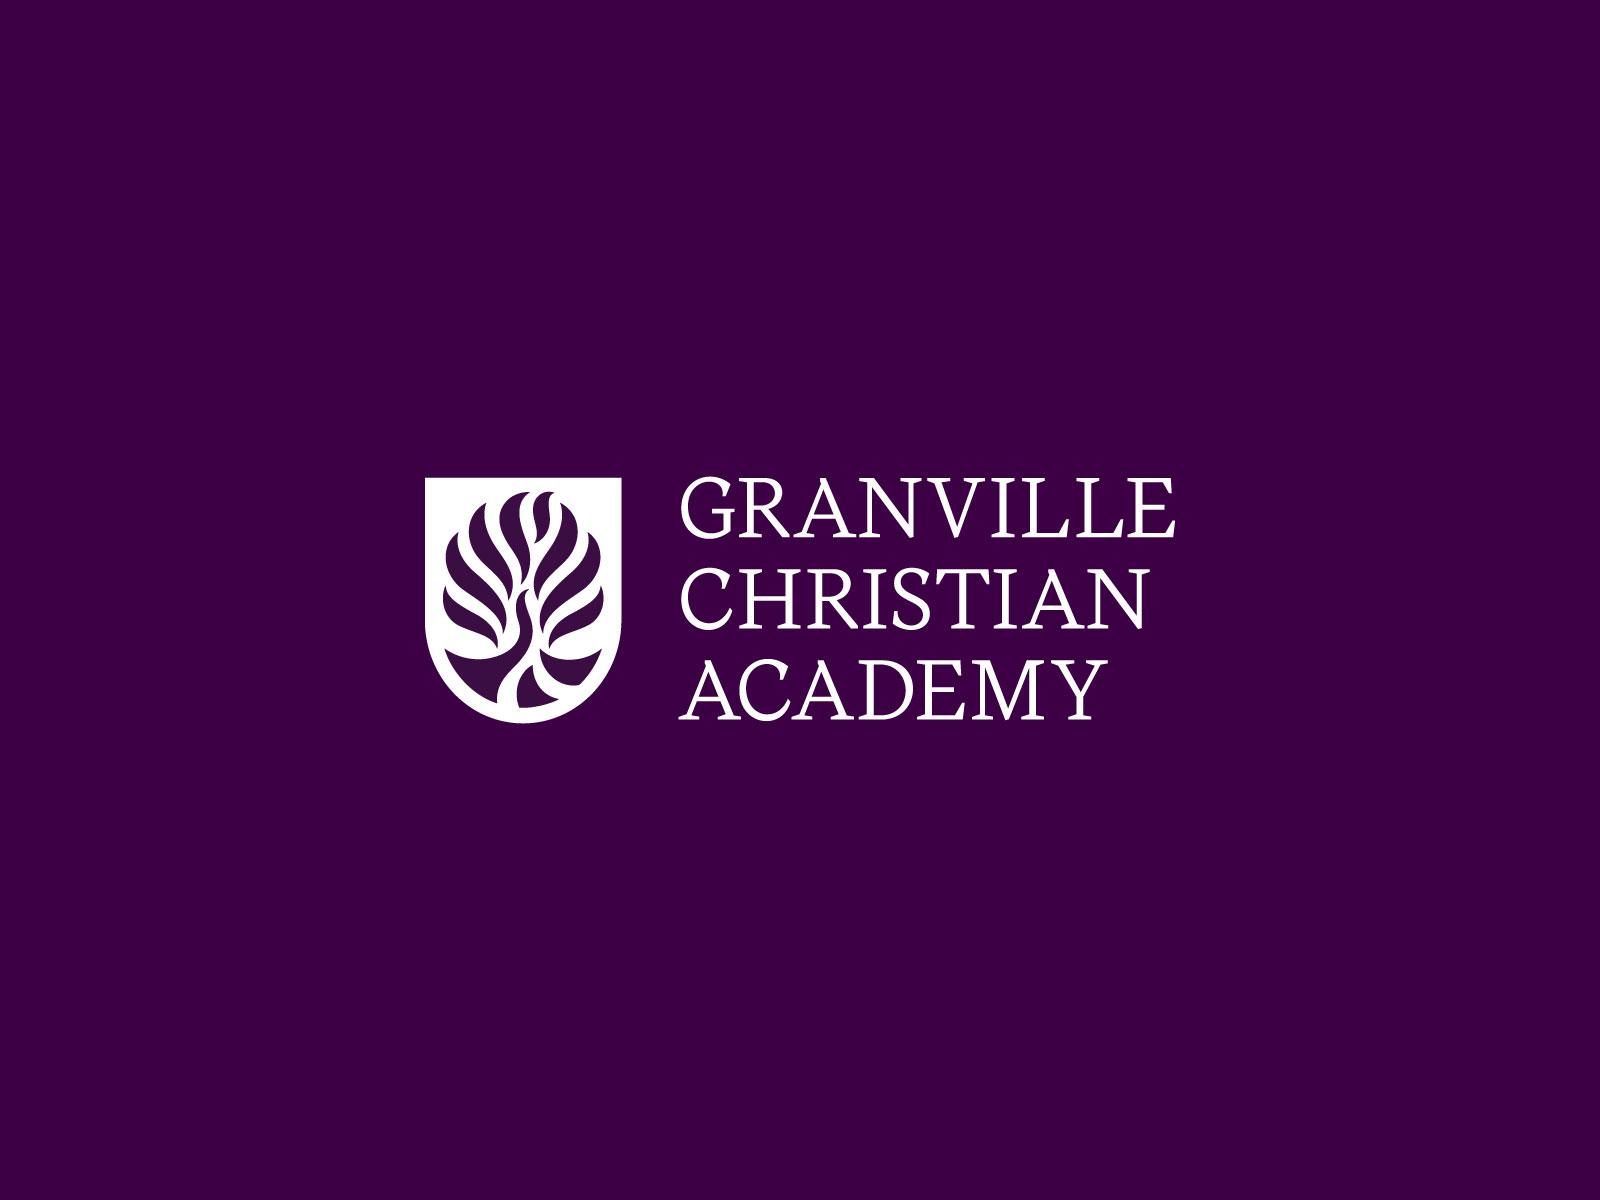 Studio Freight - Granville Christian Academy Logo Banner